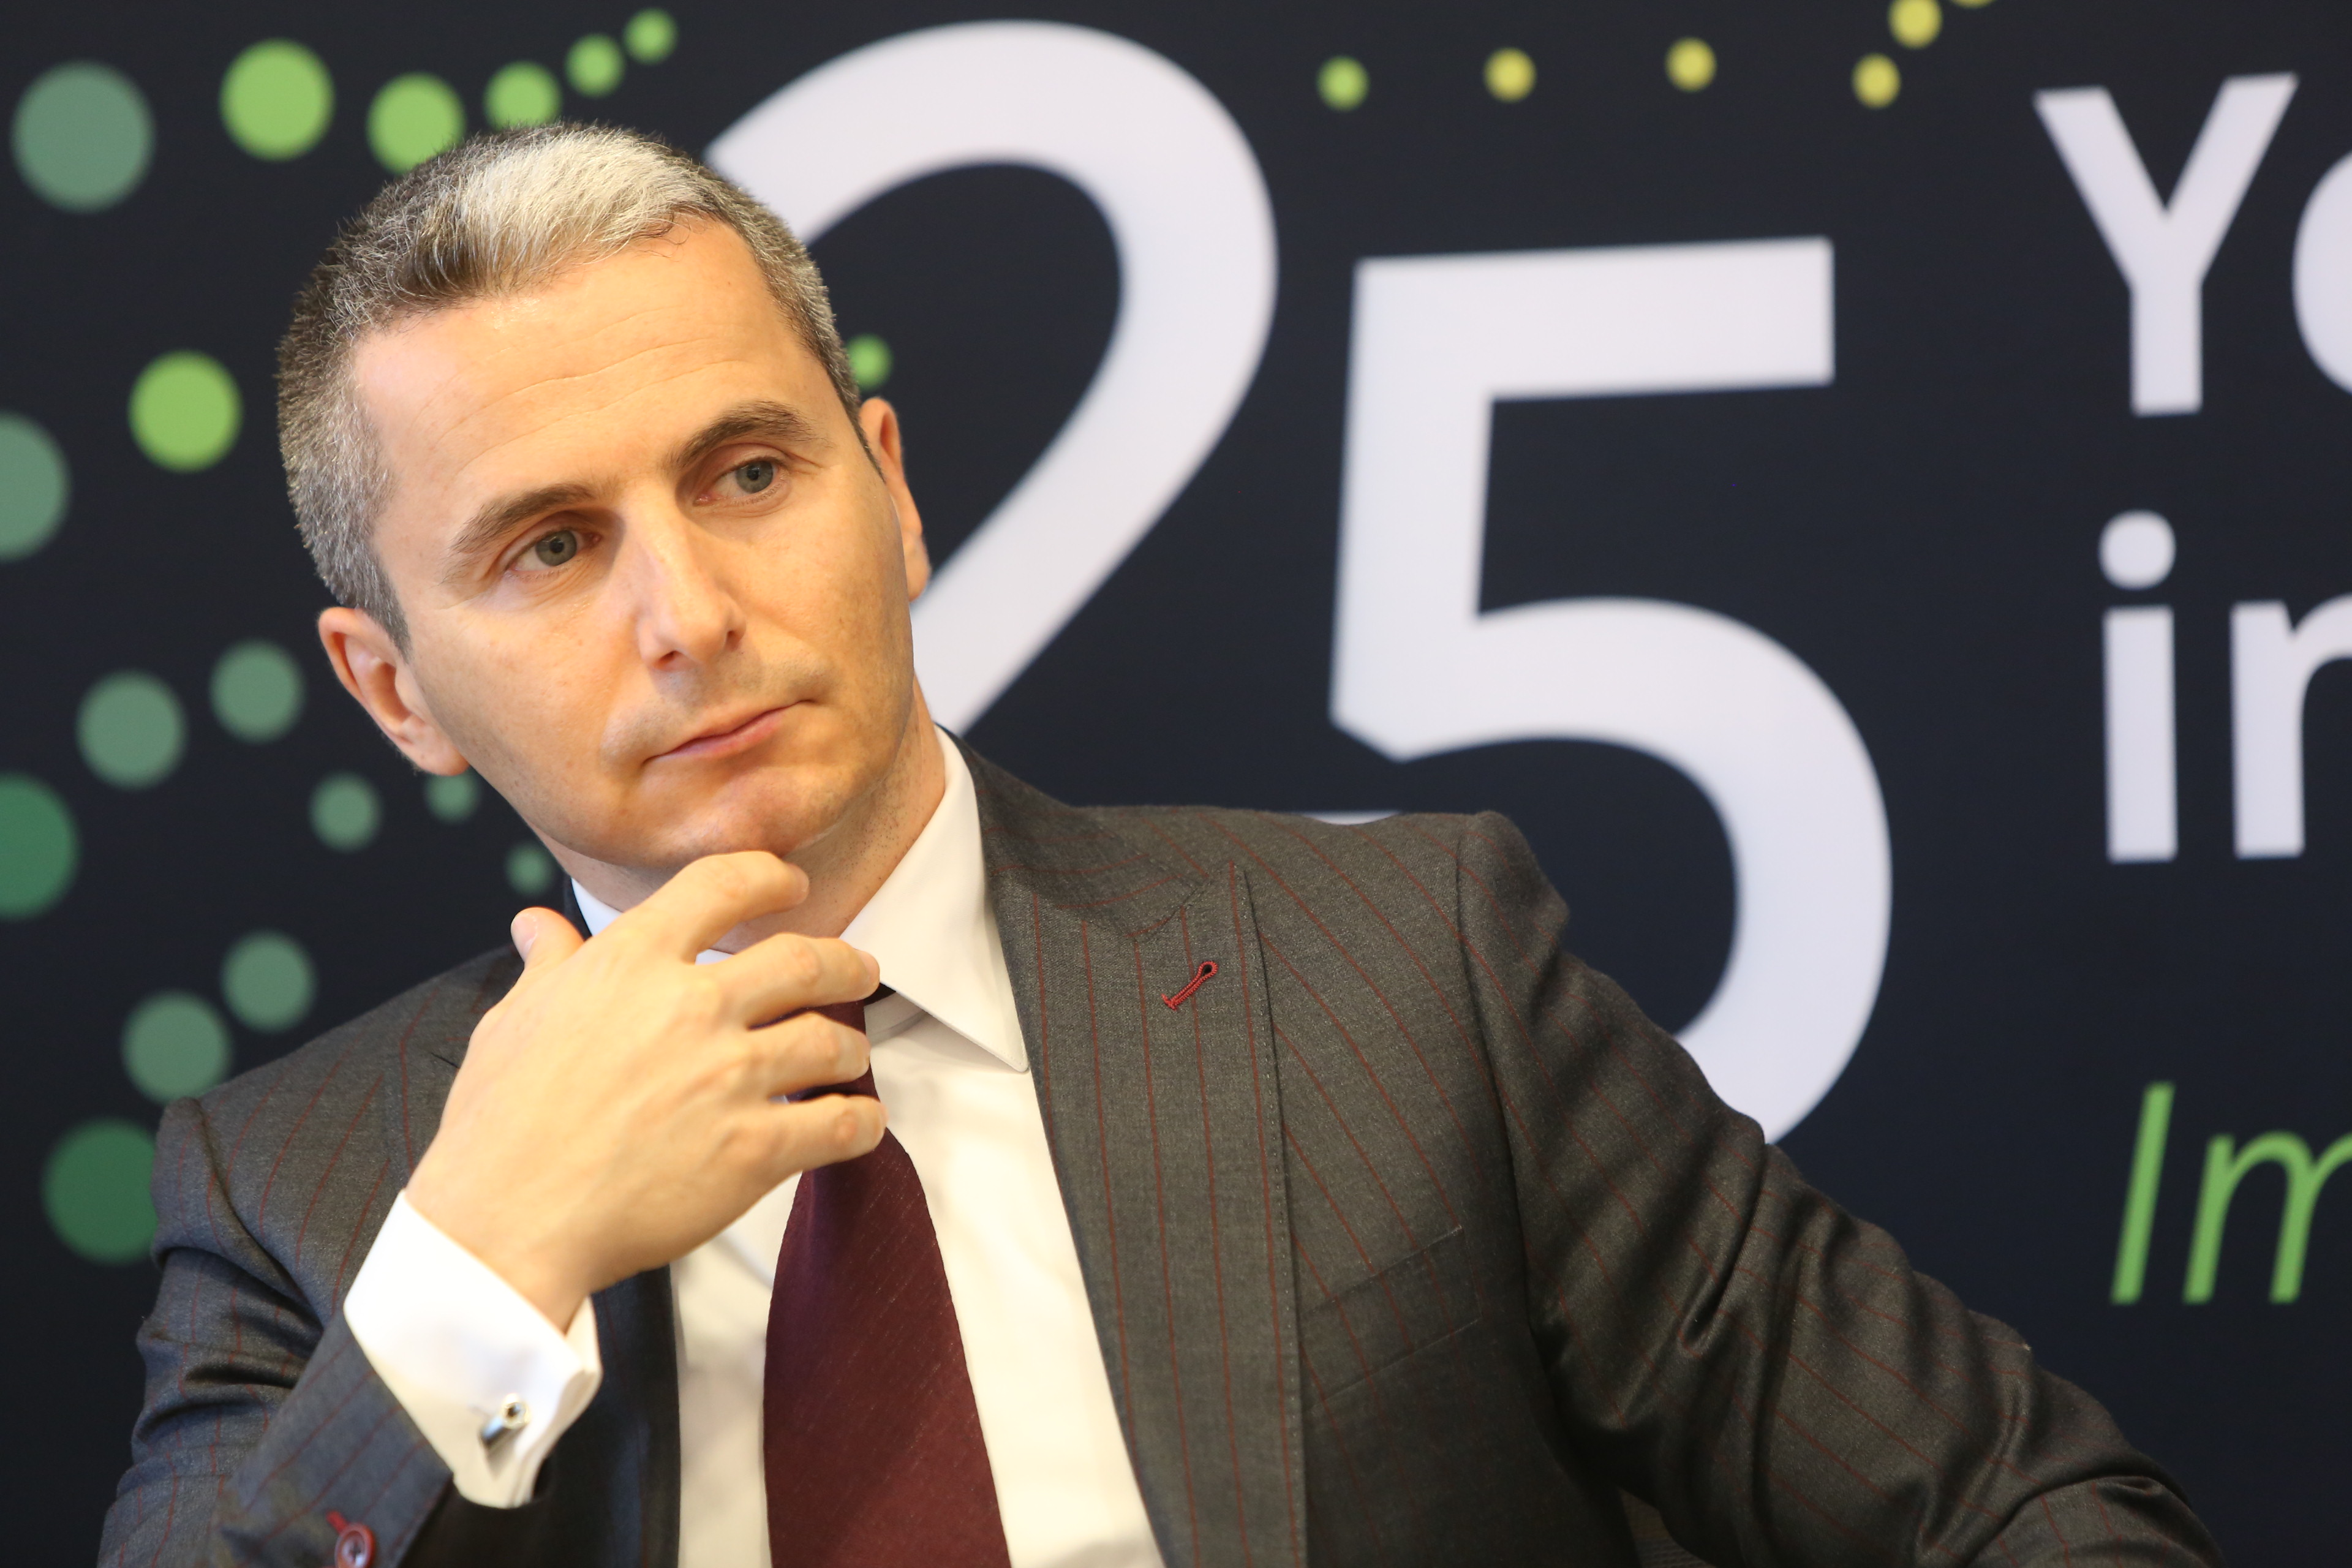 Alexandru Reff preia ștafeta conducerii Deloitte România